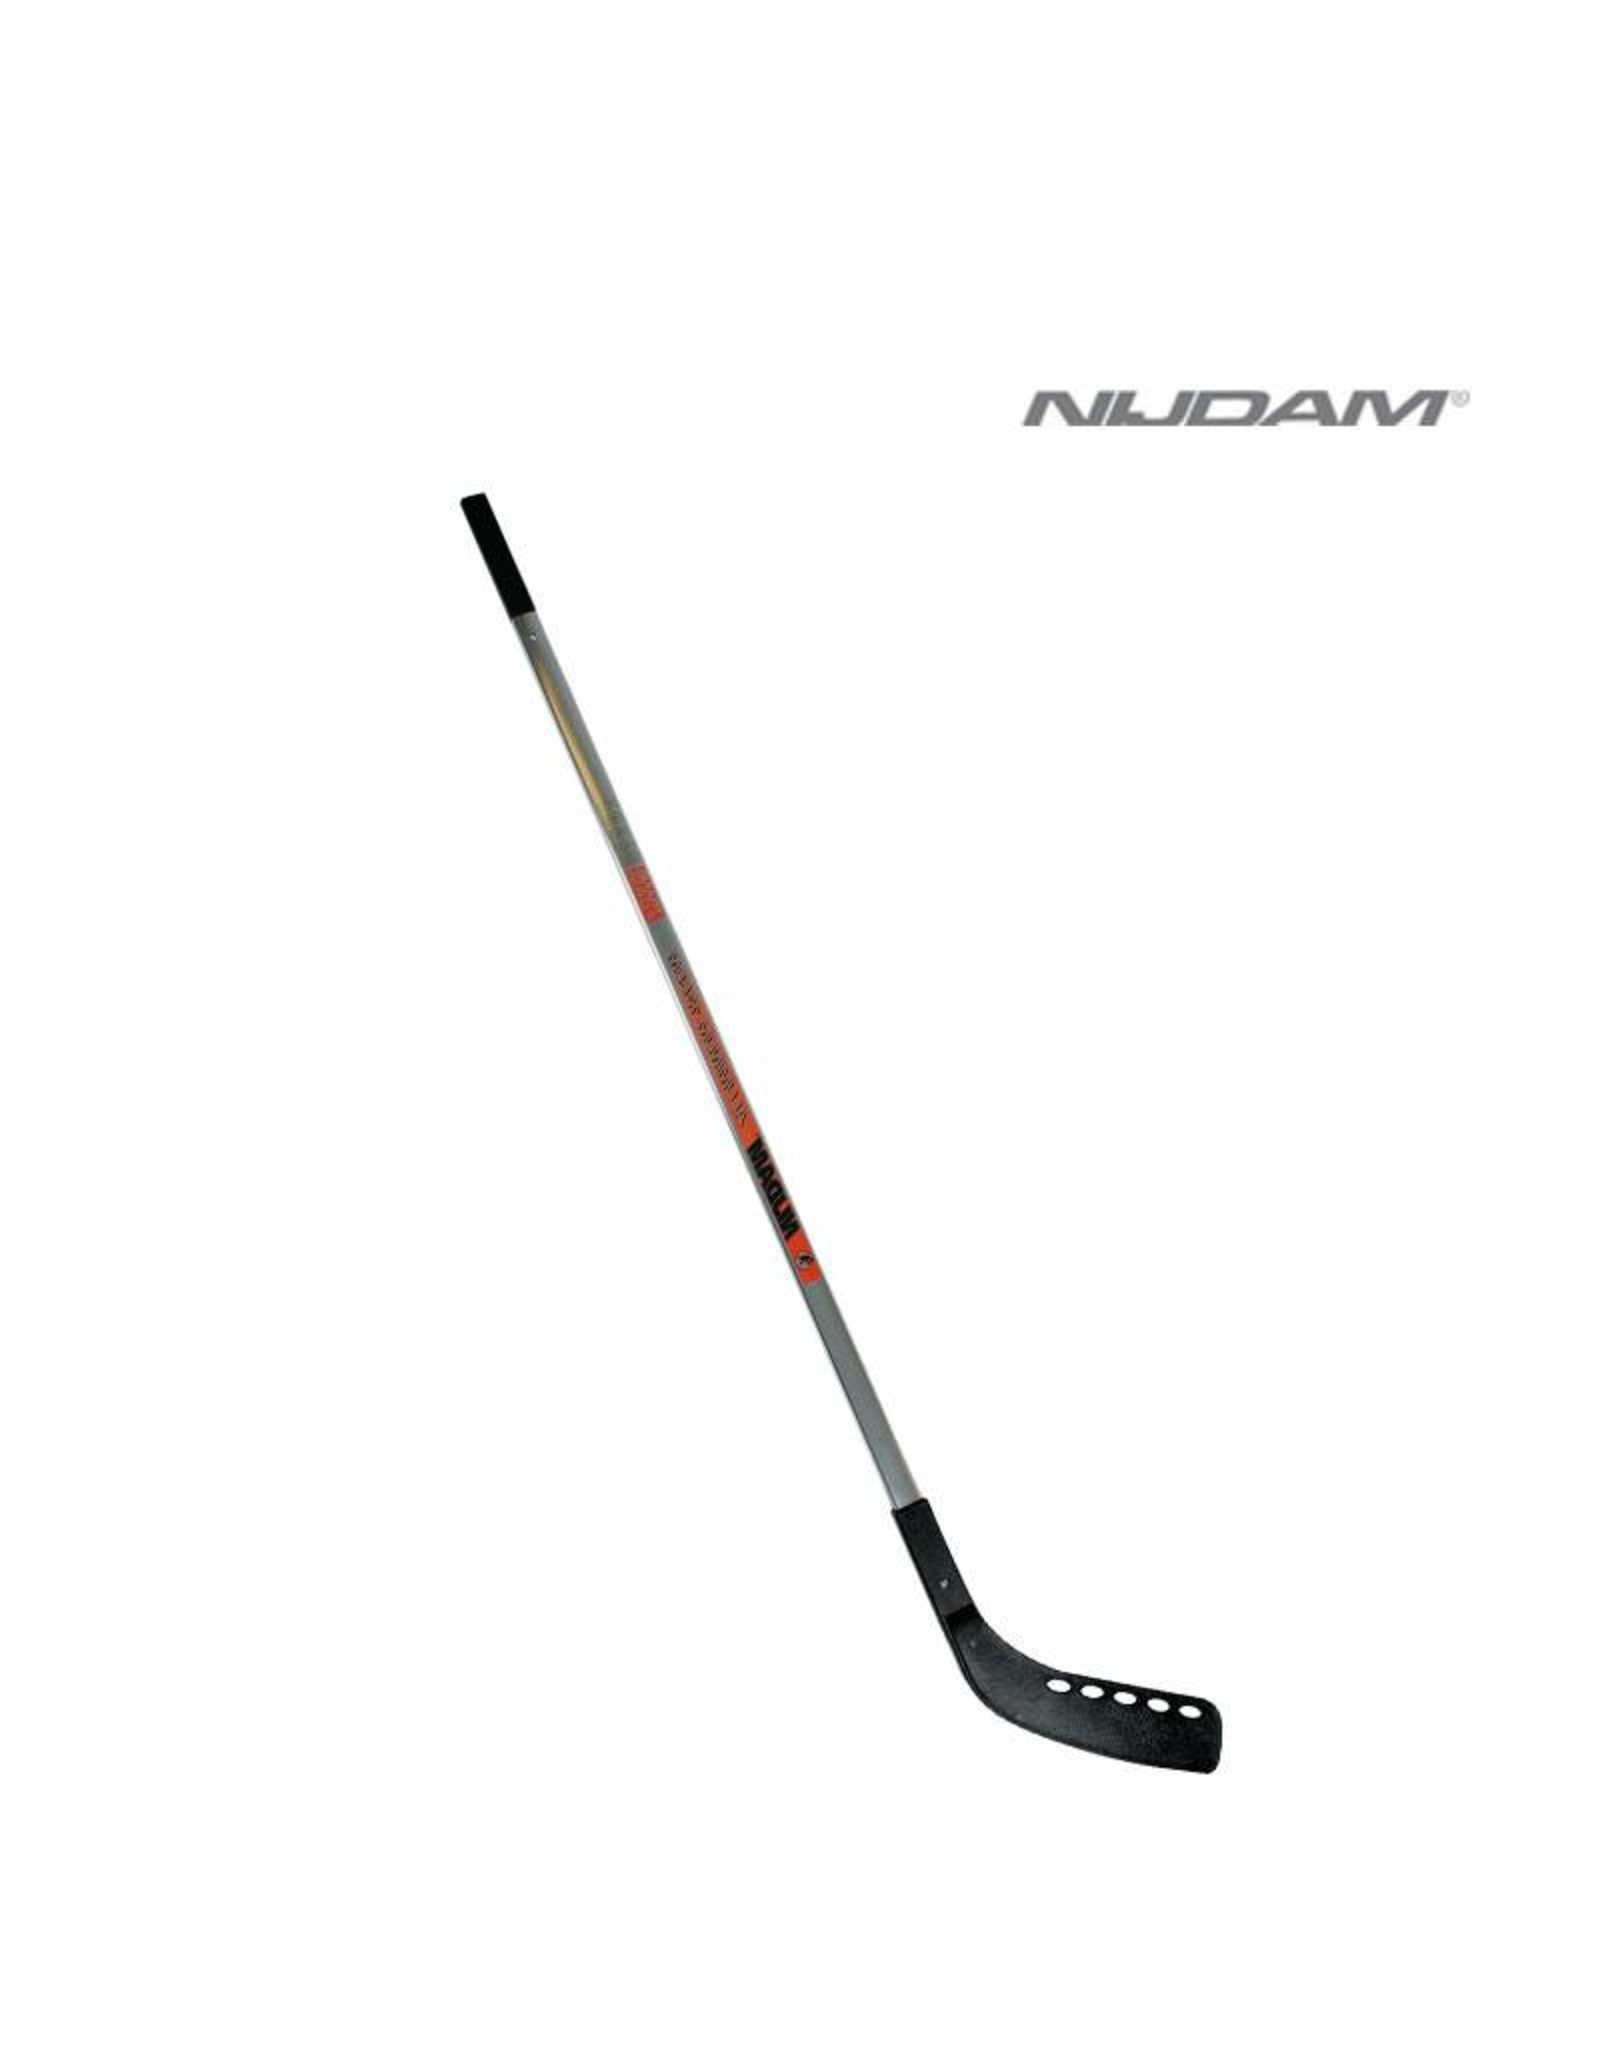 NIJDAM NIJDAM 0180 IJSHOCKEY STICK (135cm) Zilver/Rood